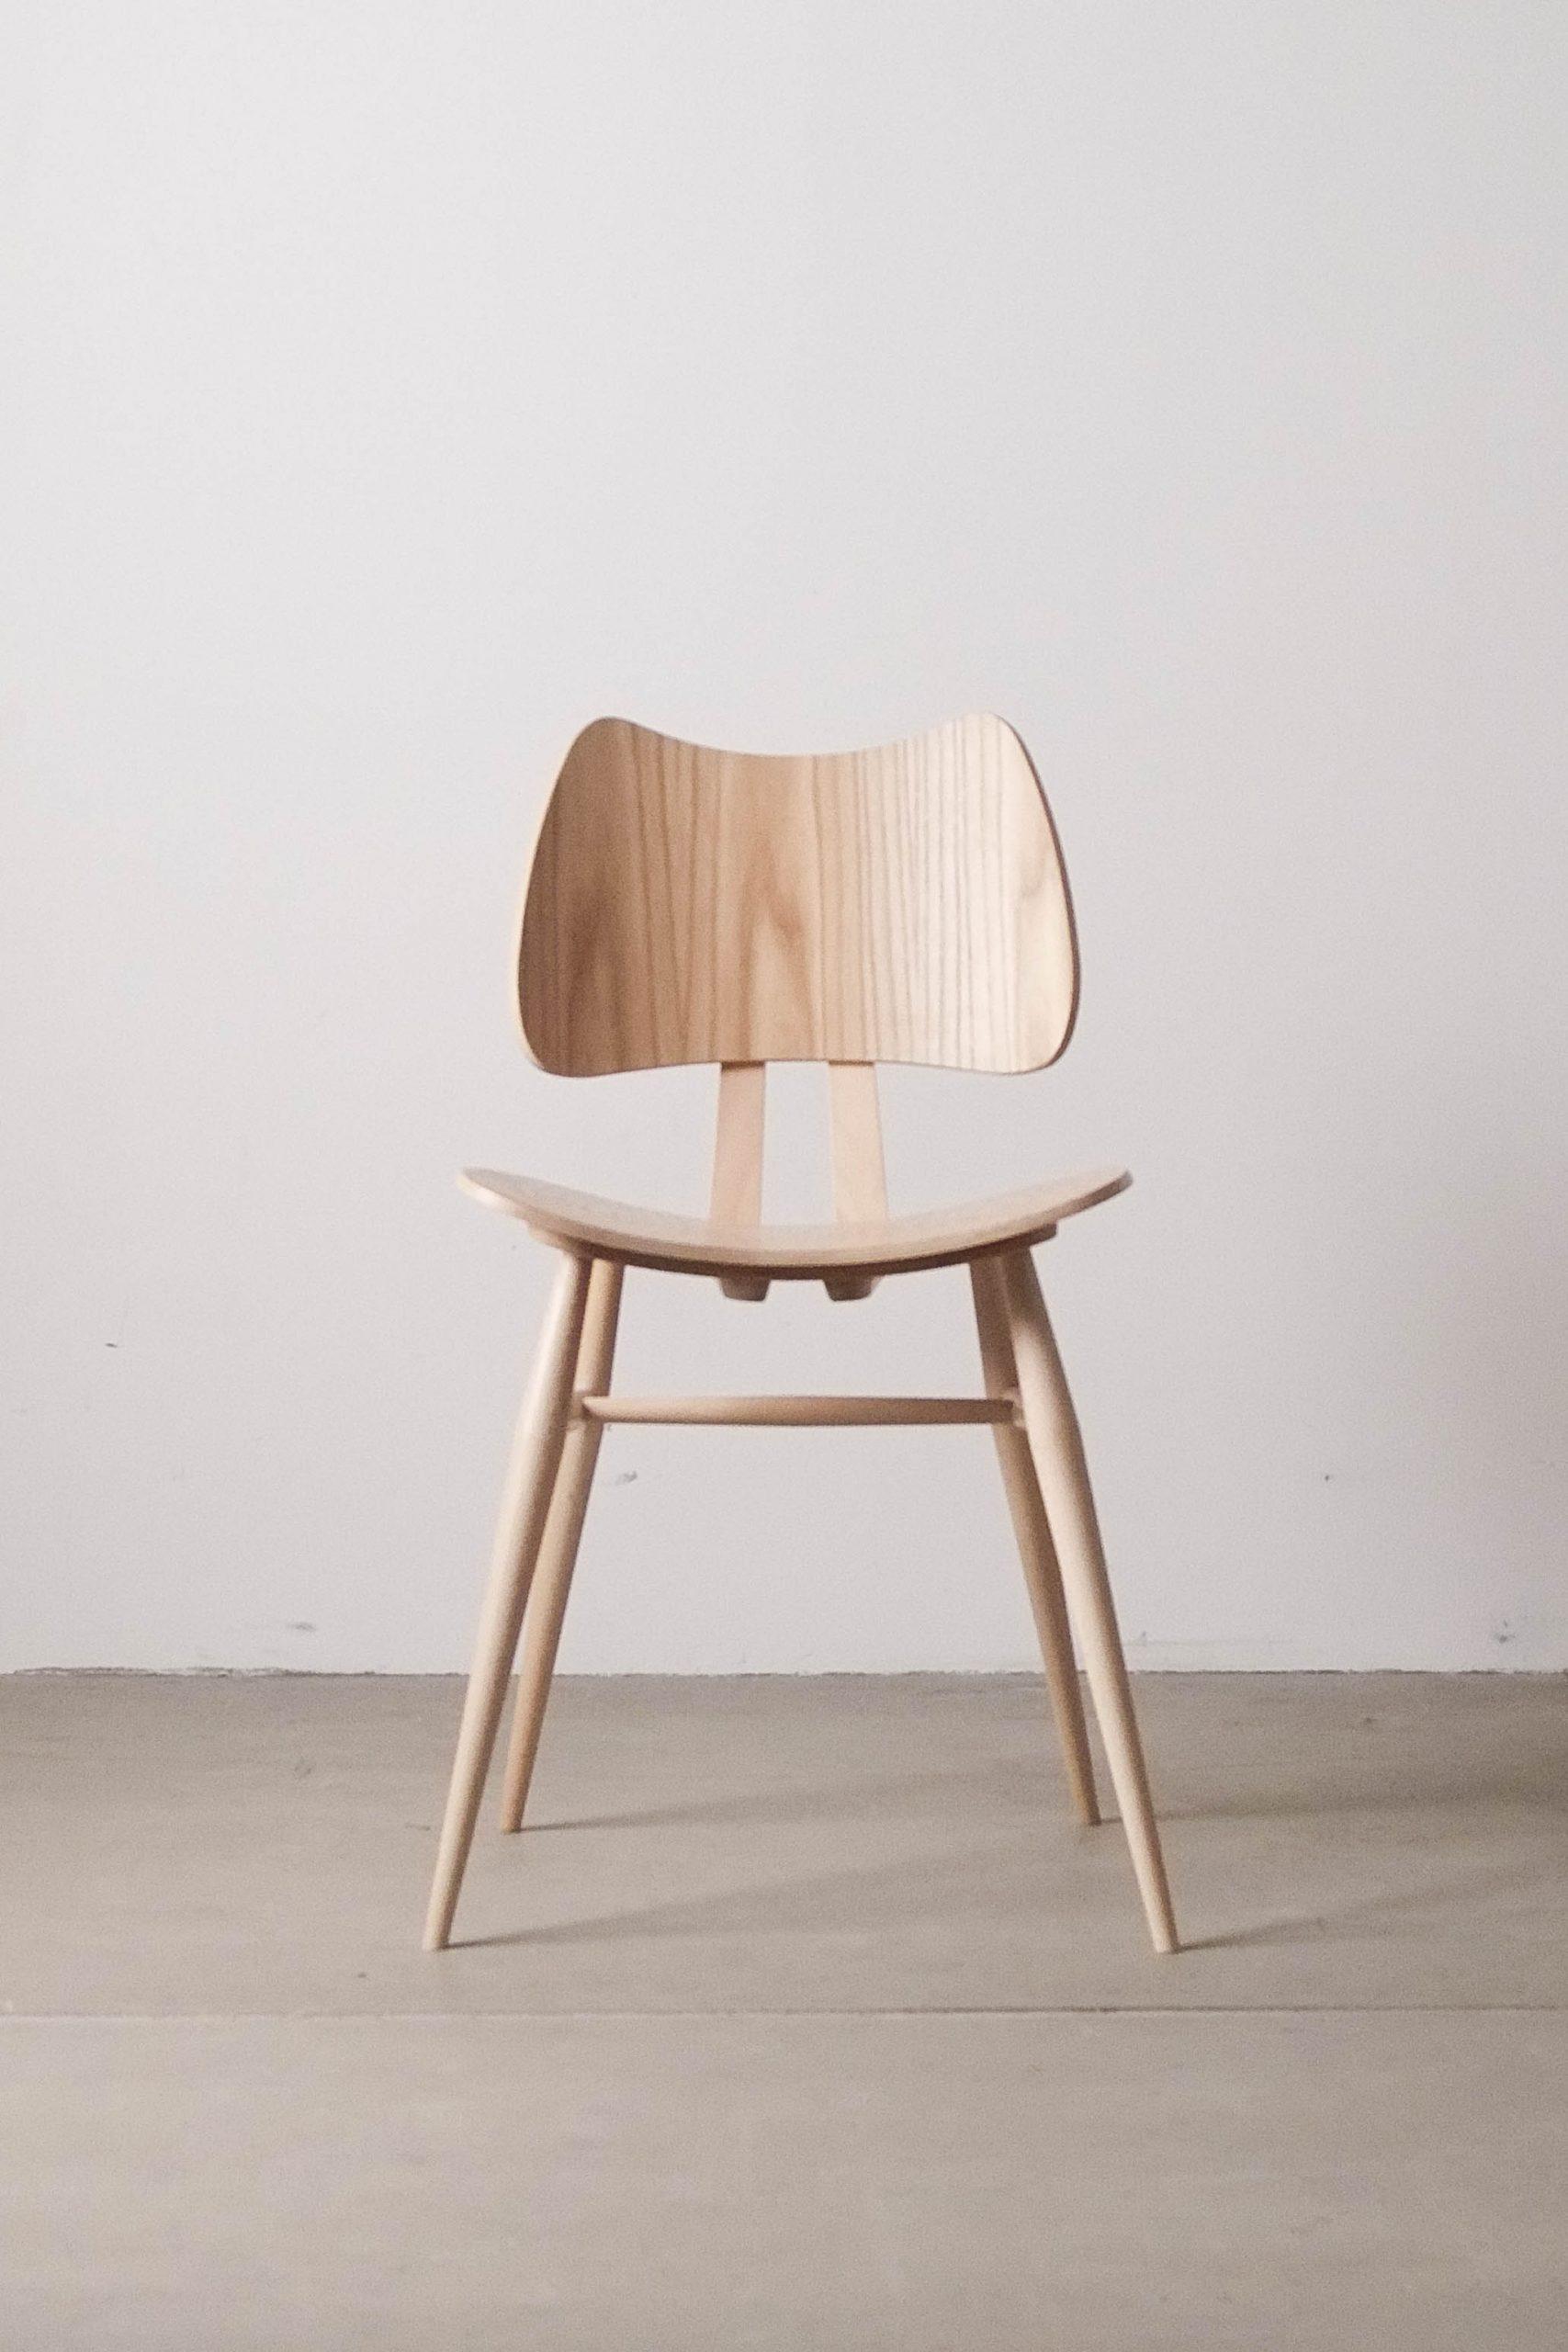 silla de comedor ercol hecha a mano reino unido mid century diseño ercolani